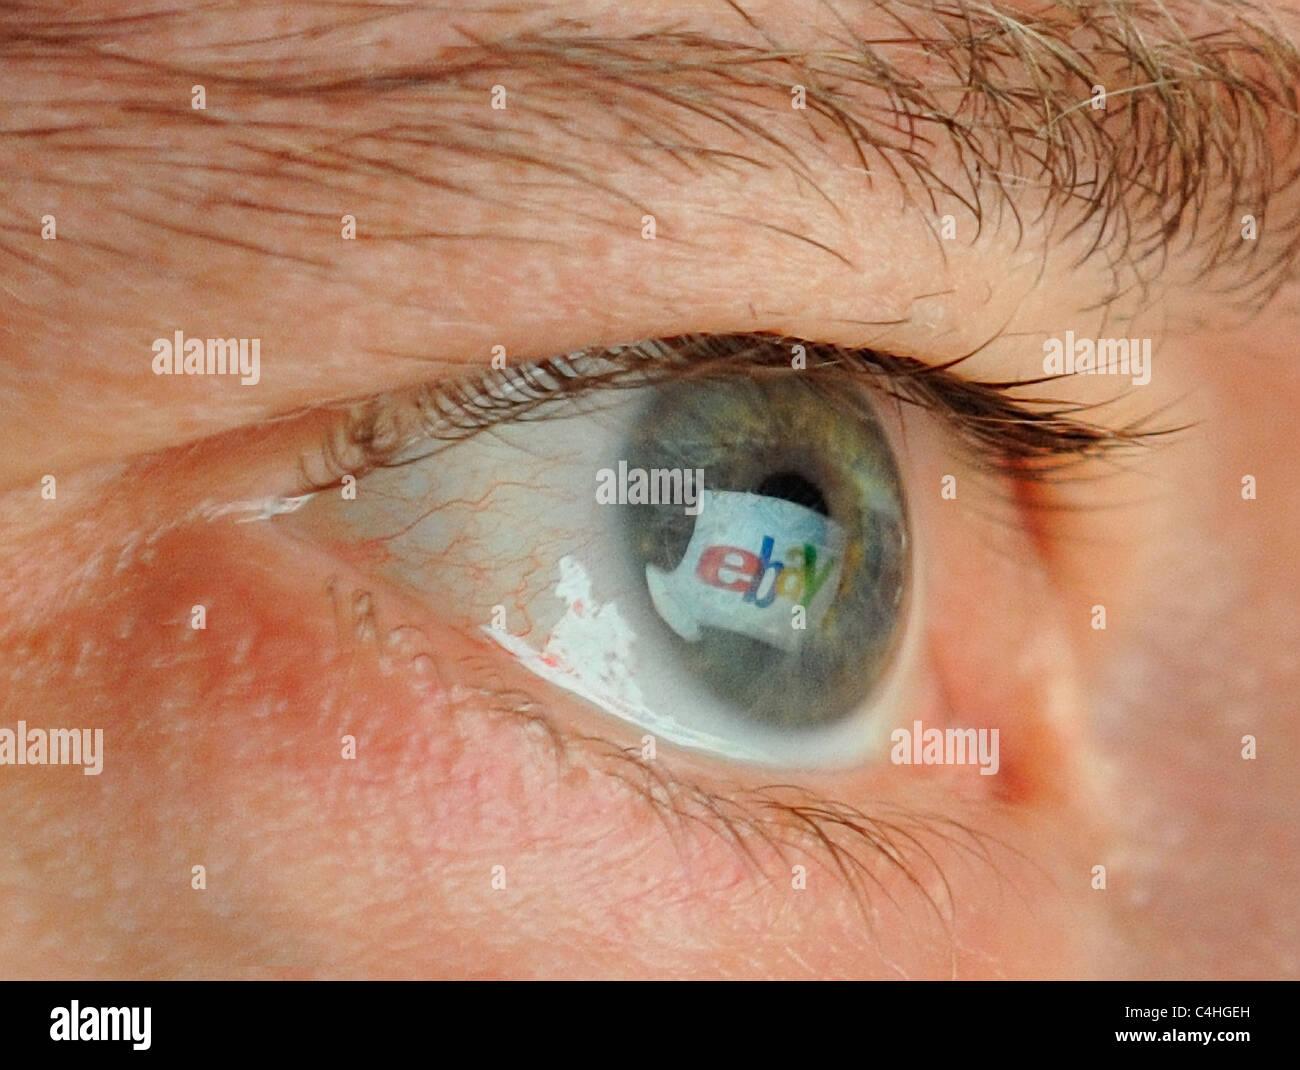 Company Logo mirrored in Eye - Stock Image